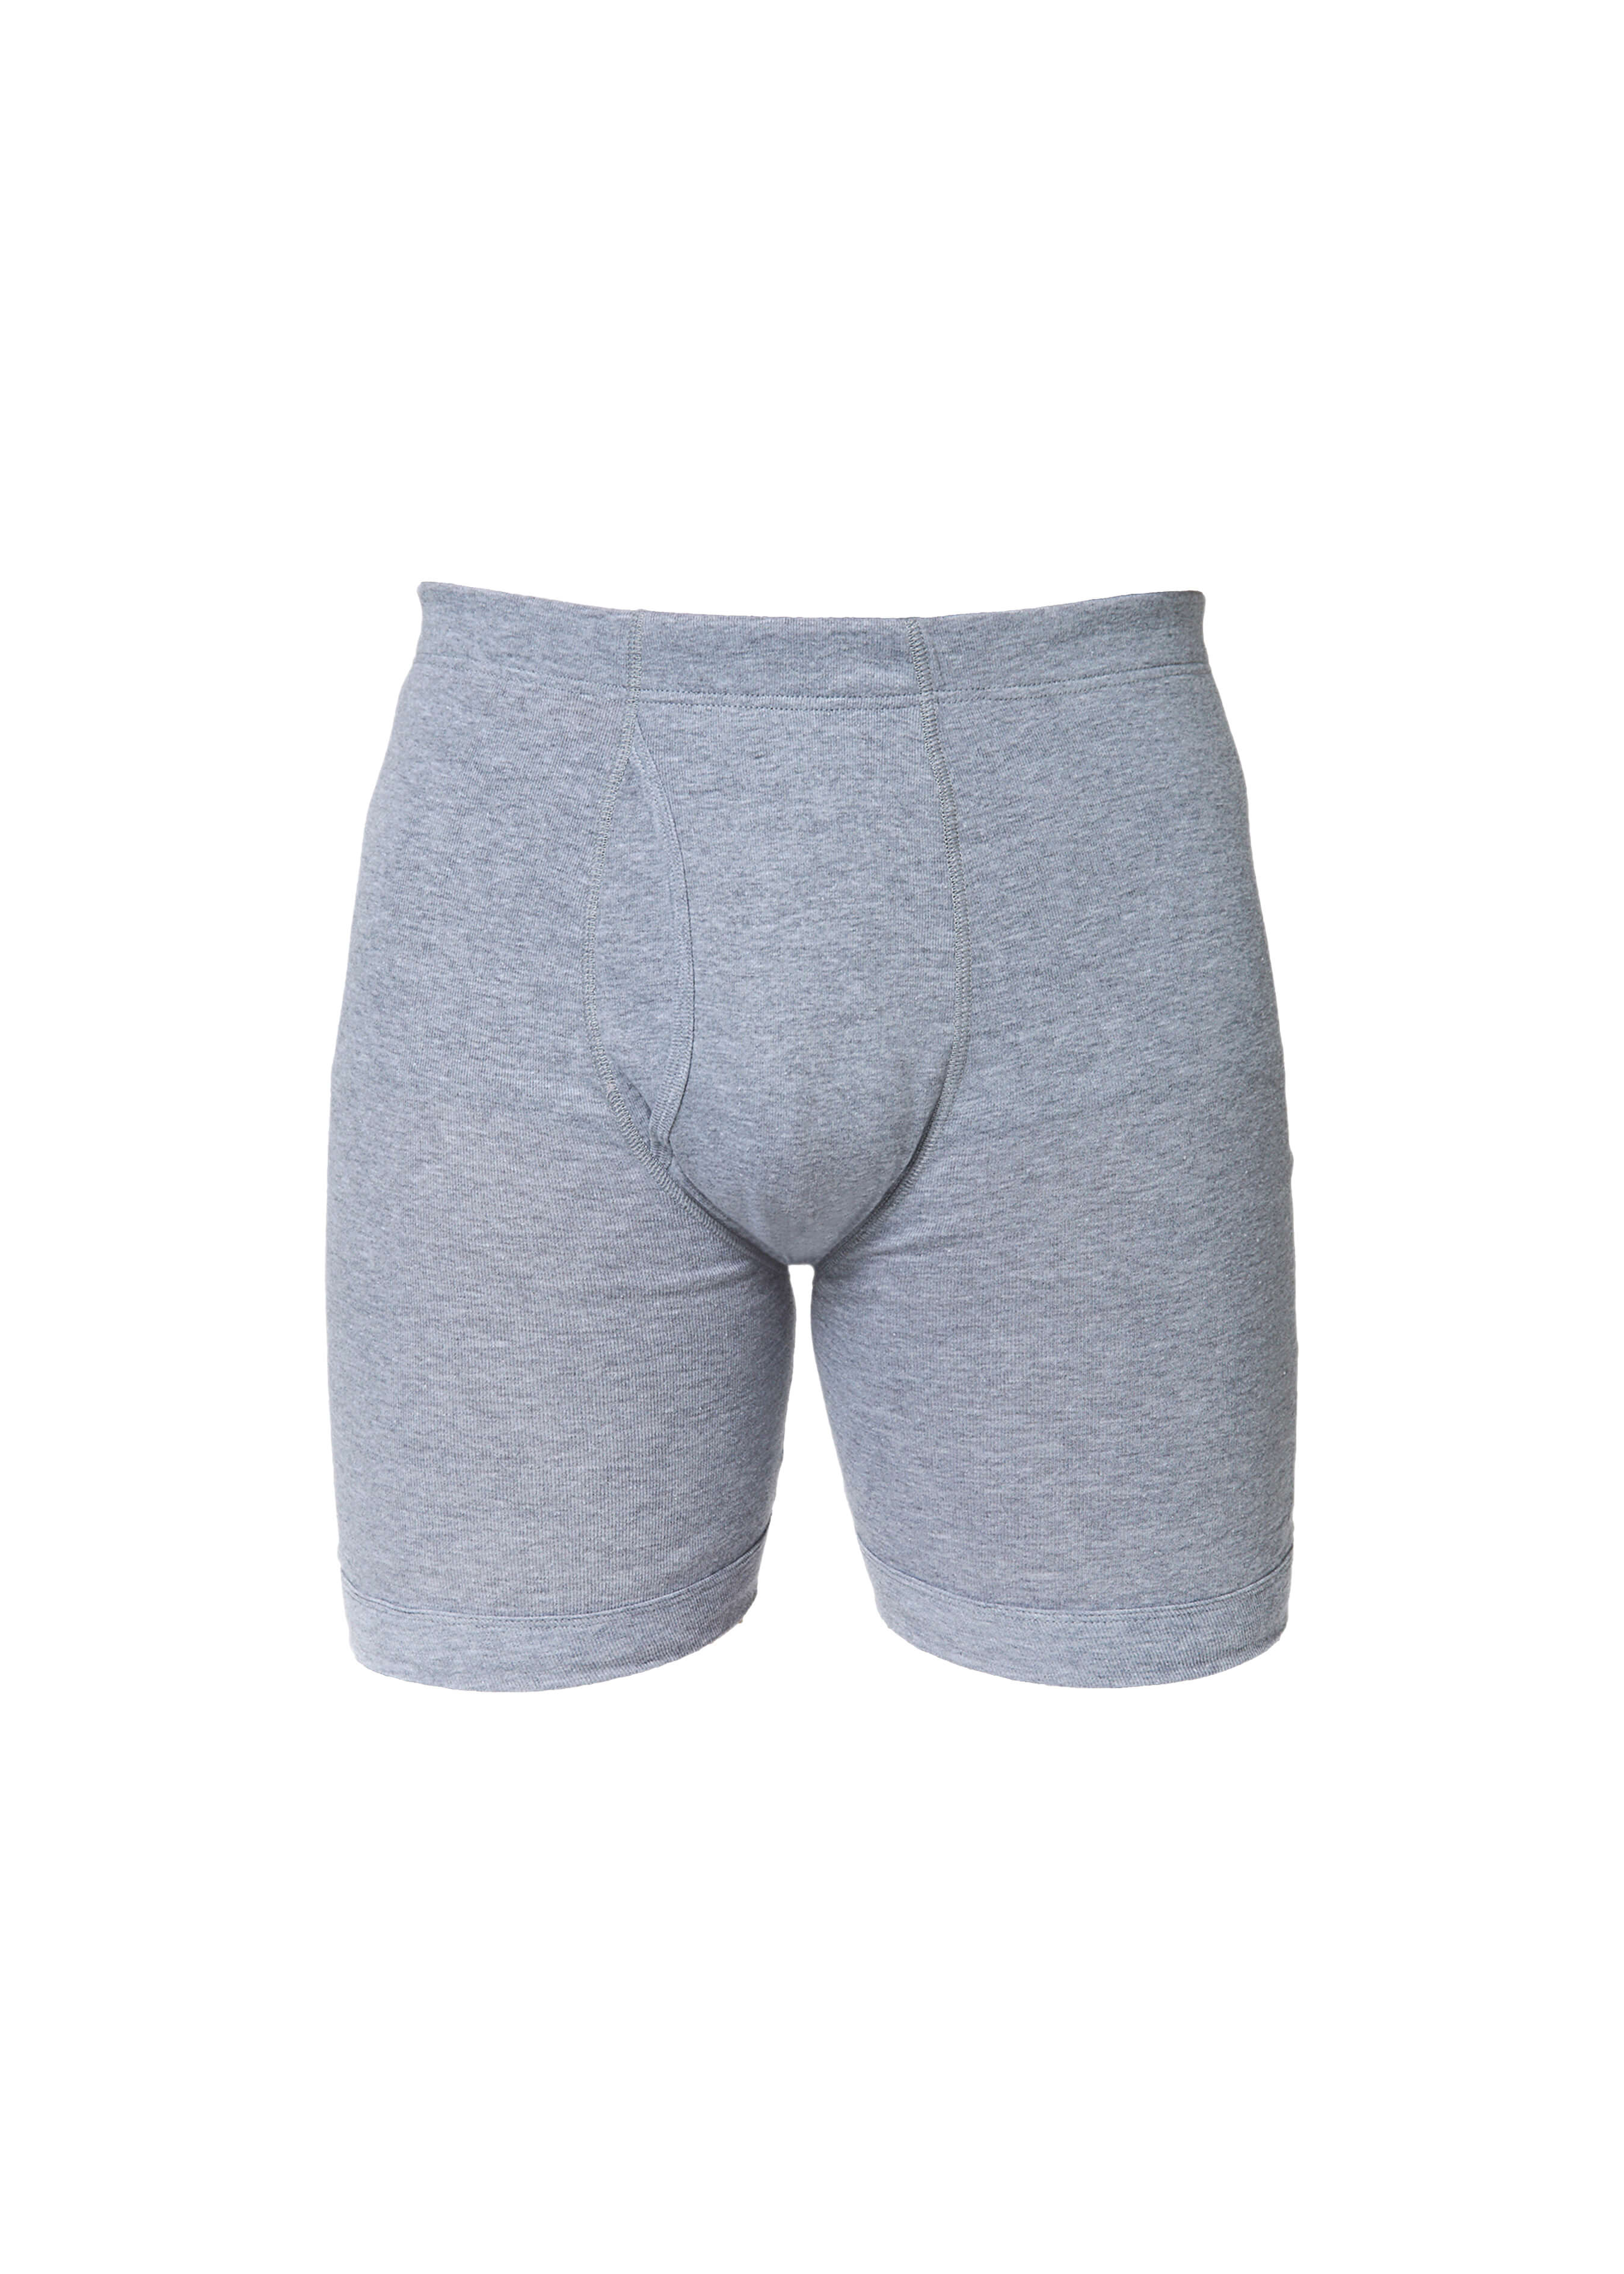 Herren Boxer-Shorts Duopack 279211L 2